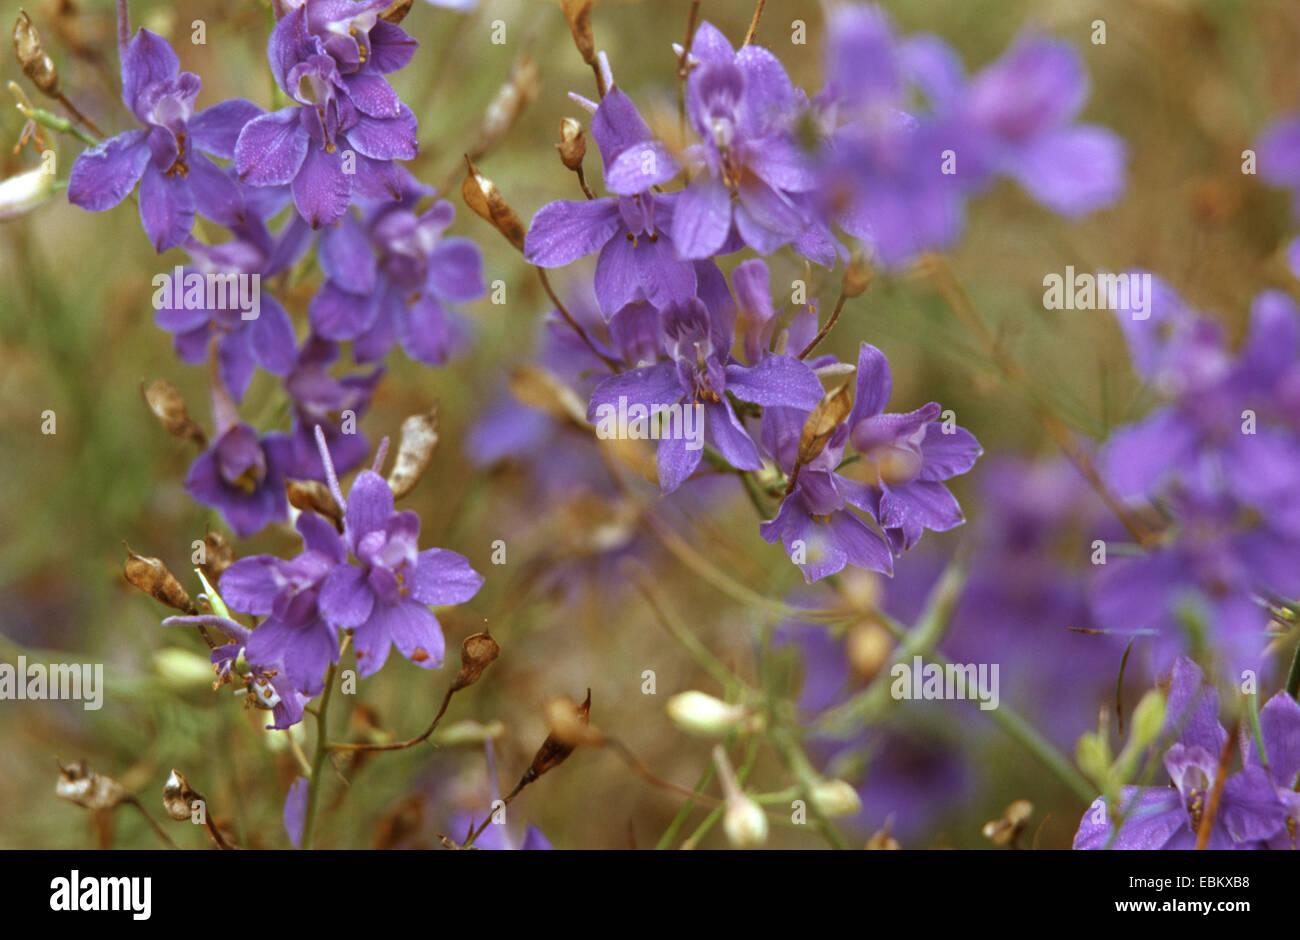 forking larkspur, field larkspur (Consolida regalis, Delphinium consolida), blooming - Stock Image